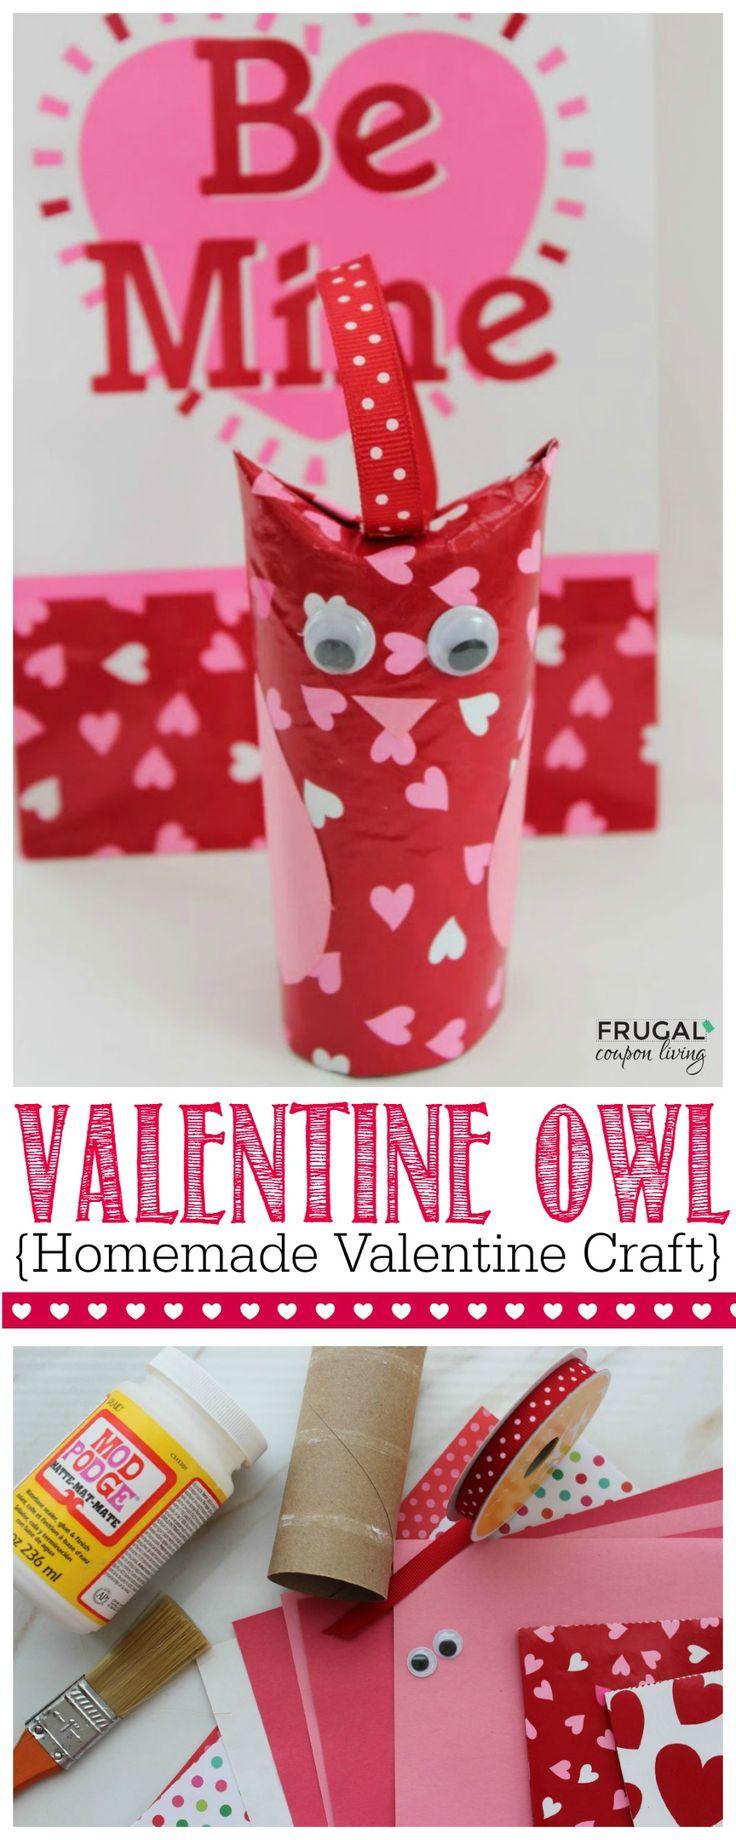 Homemade Valentines Crafts